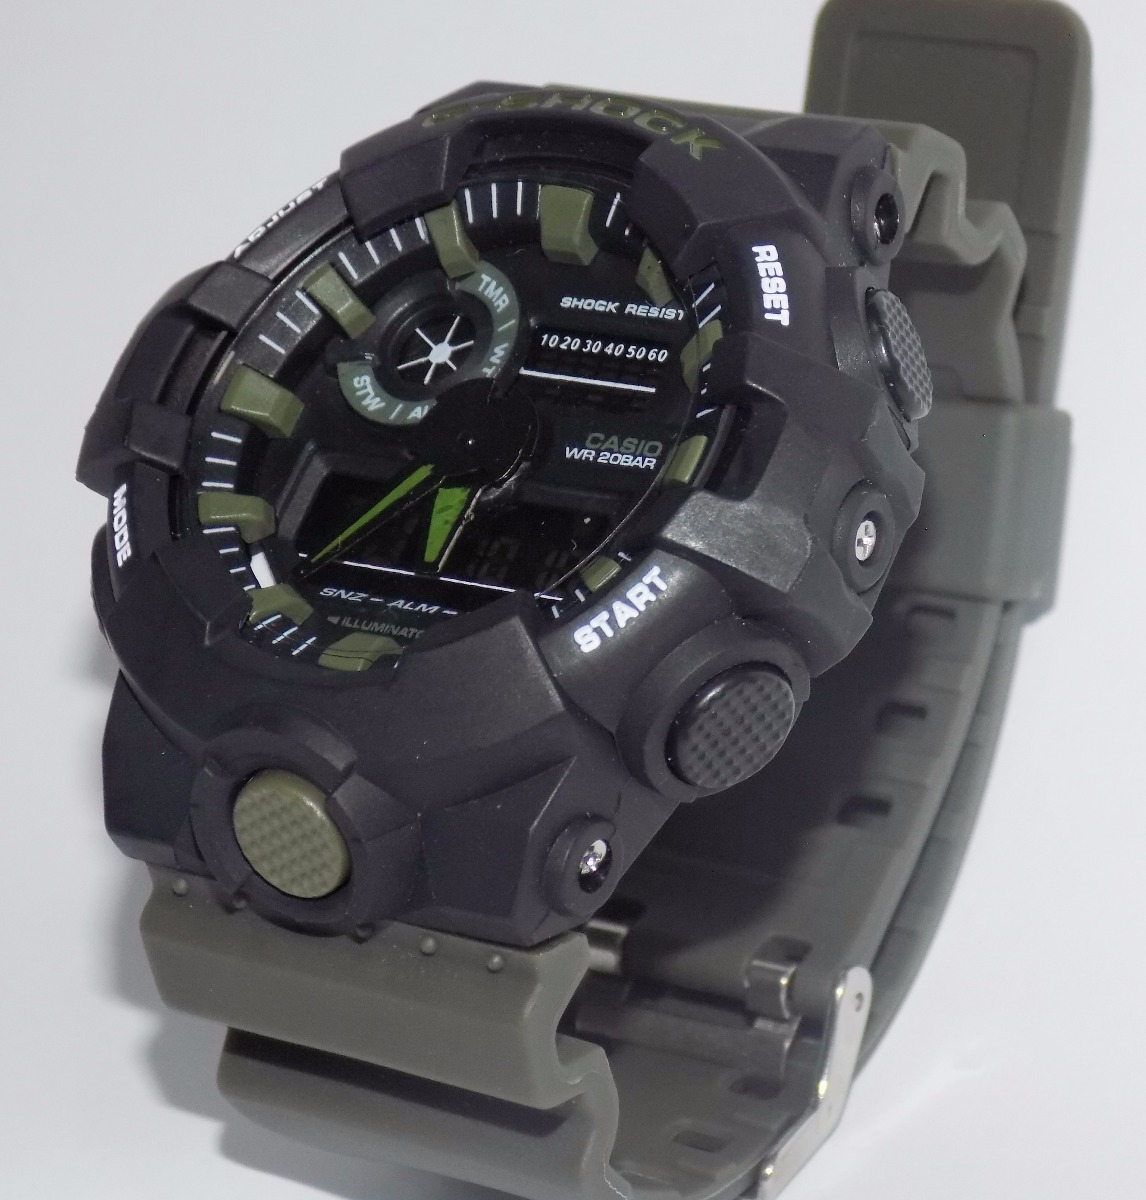 5a5463103df relógio g-shock importado masculino barato resistente a agua. Carregando  zoom.